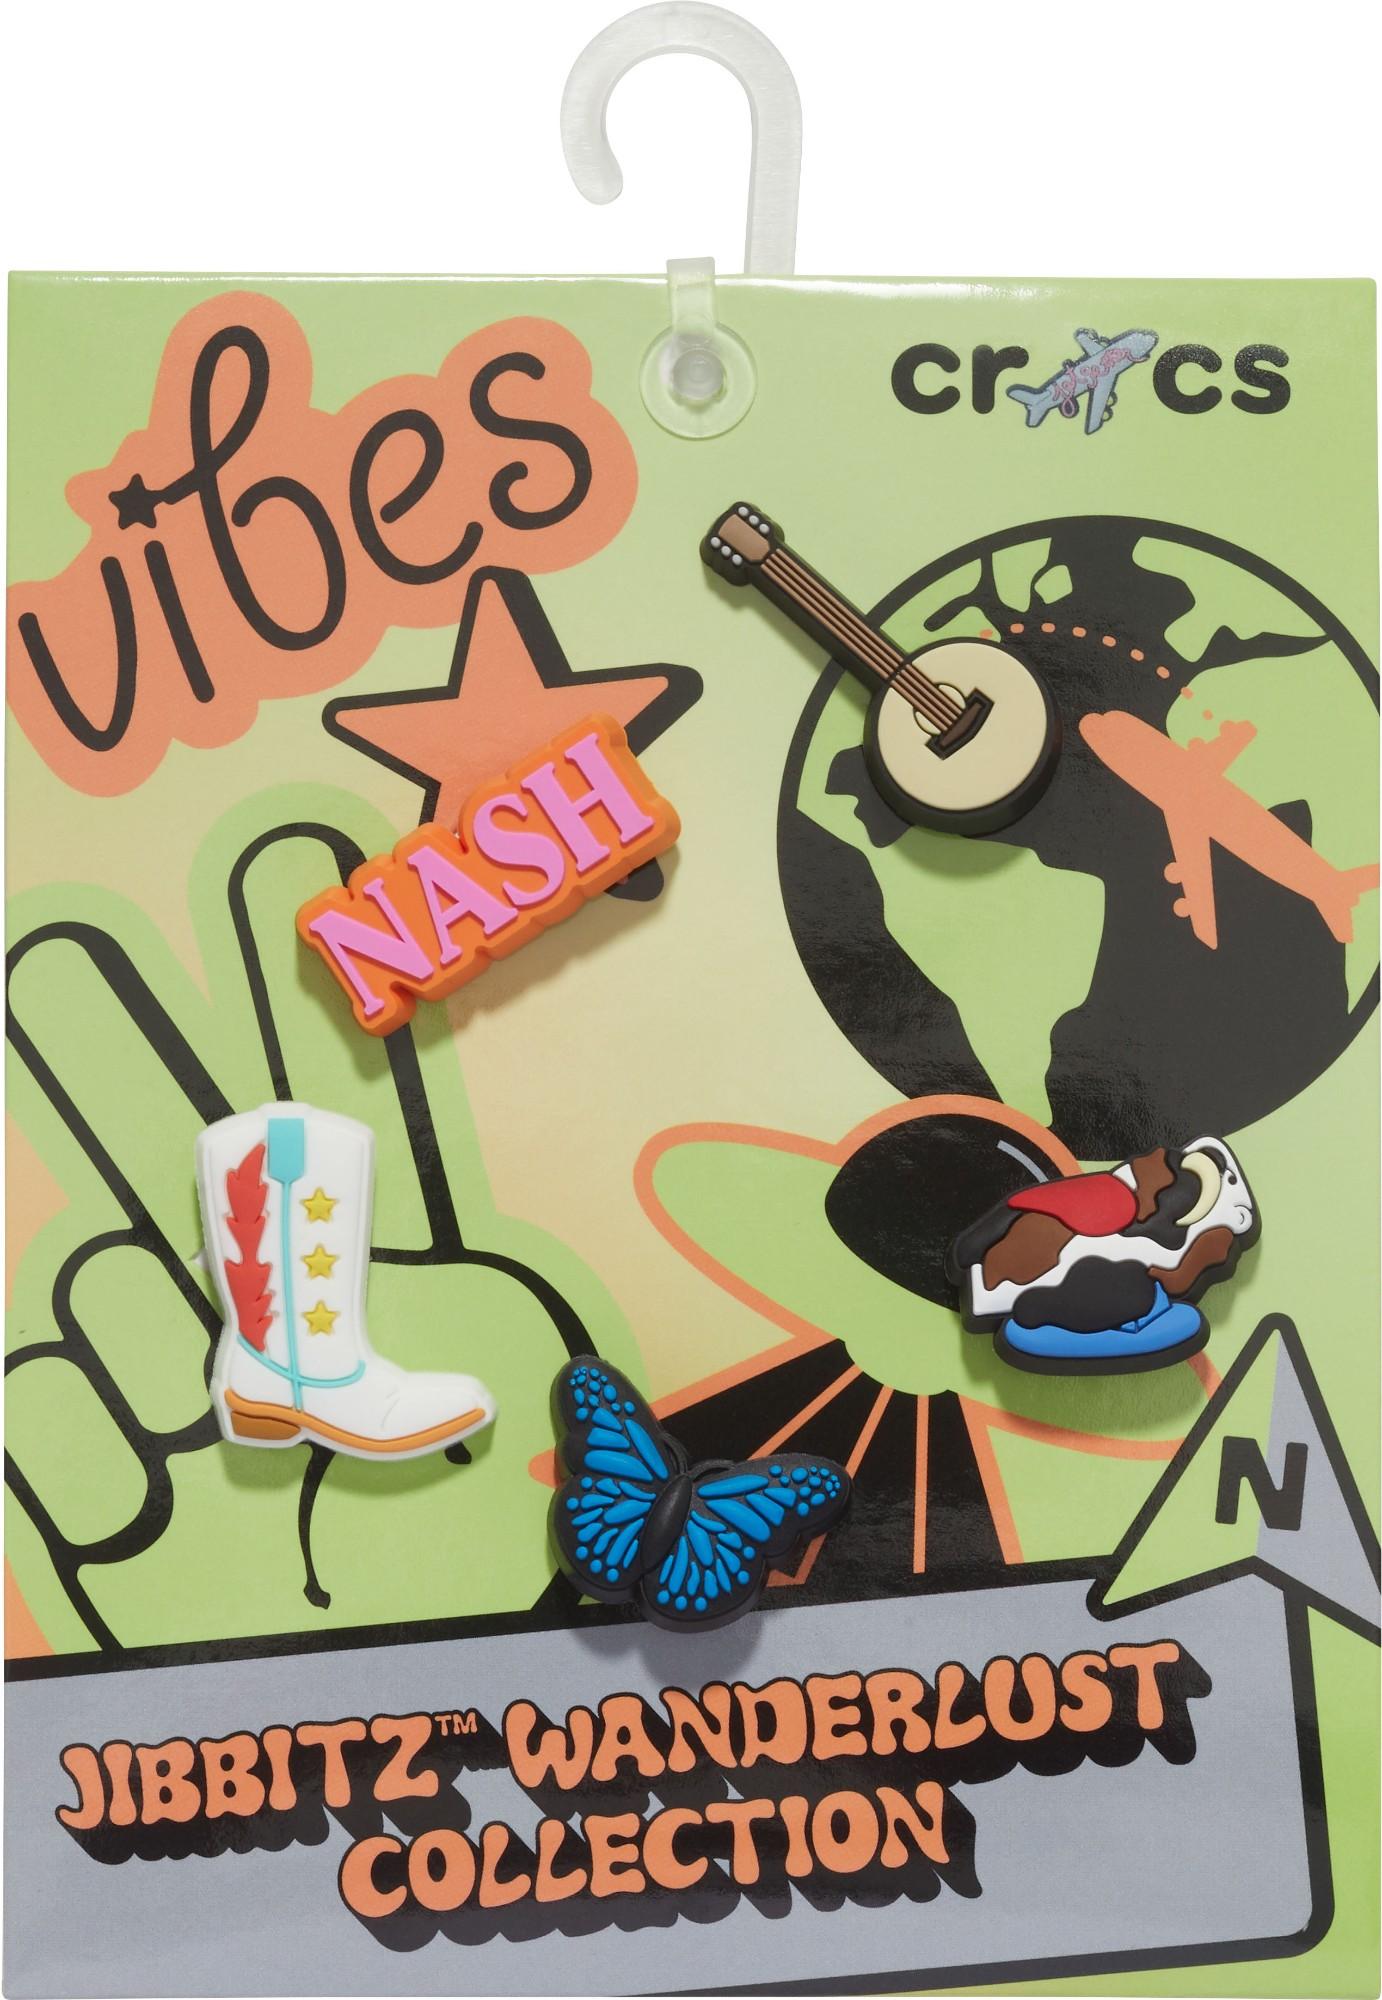 Crocs™ Crocs NASHVILLE WONDERLUST 5-PACK G0798400-MU